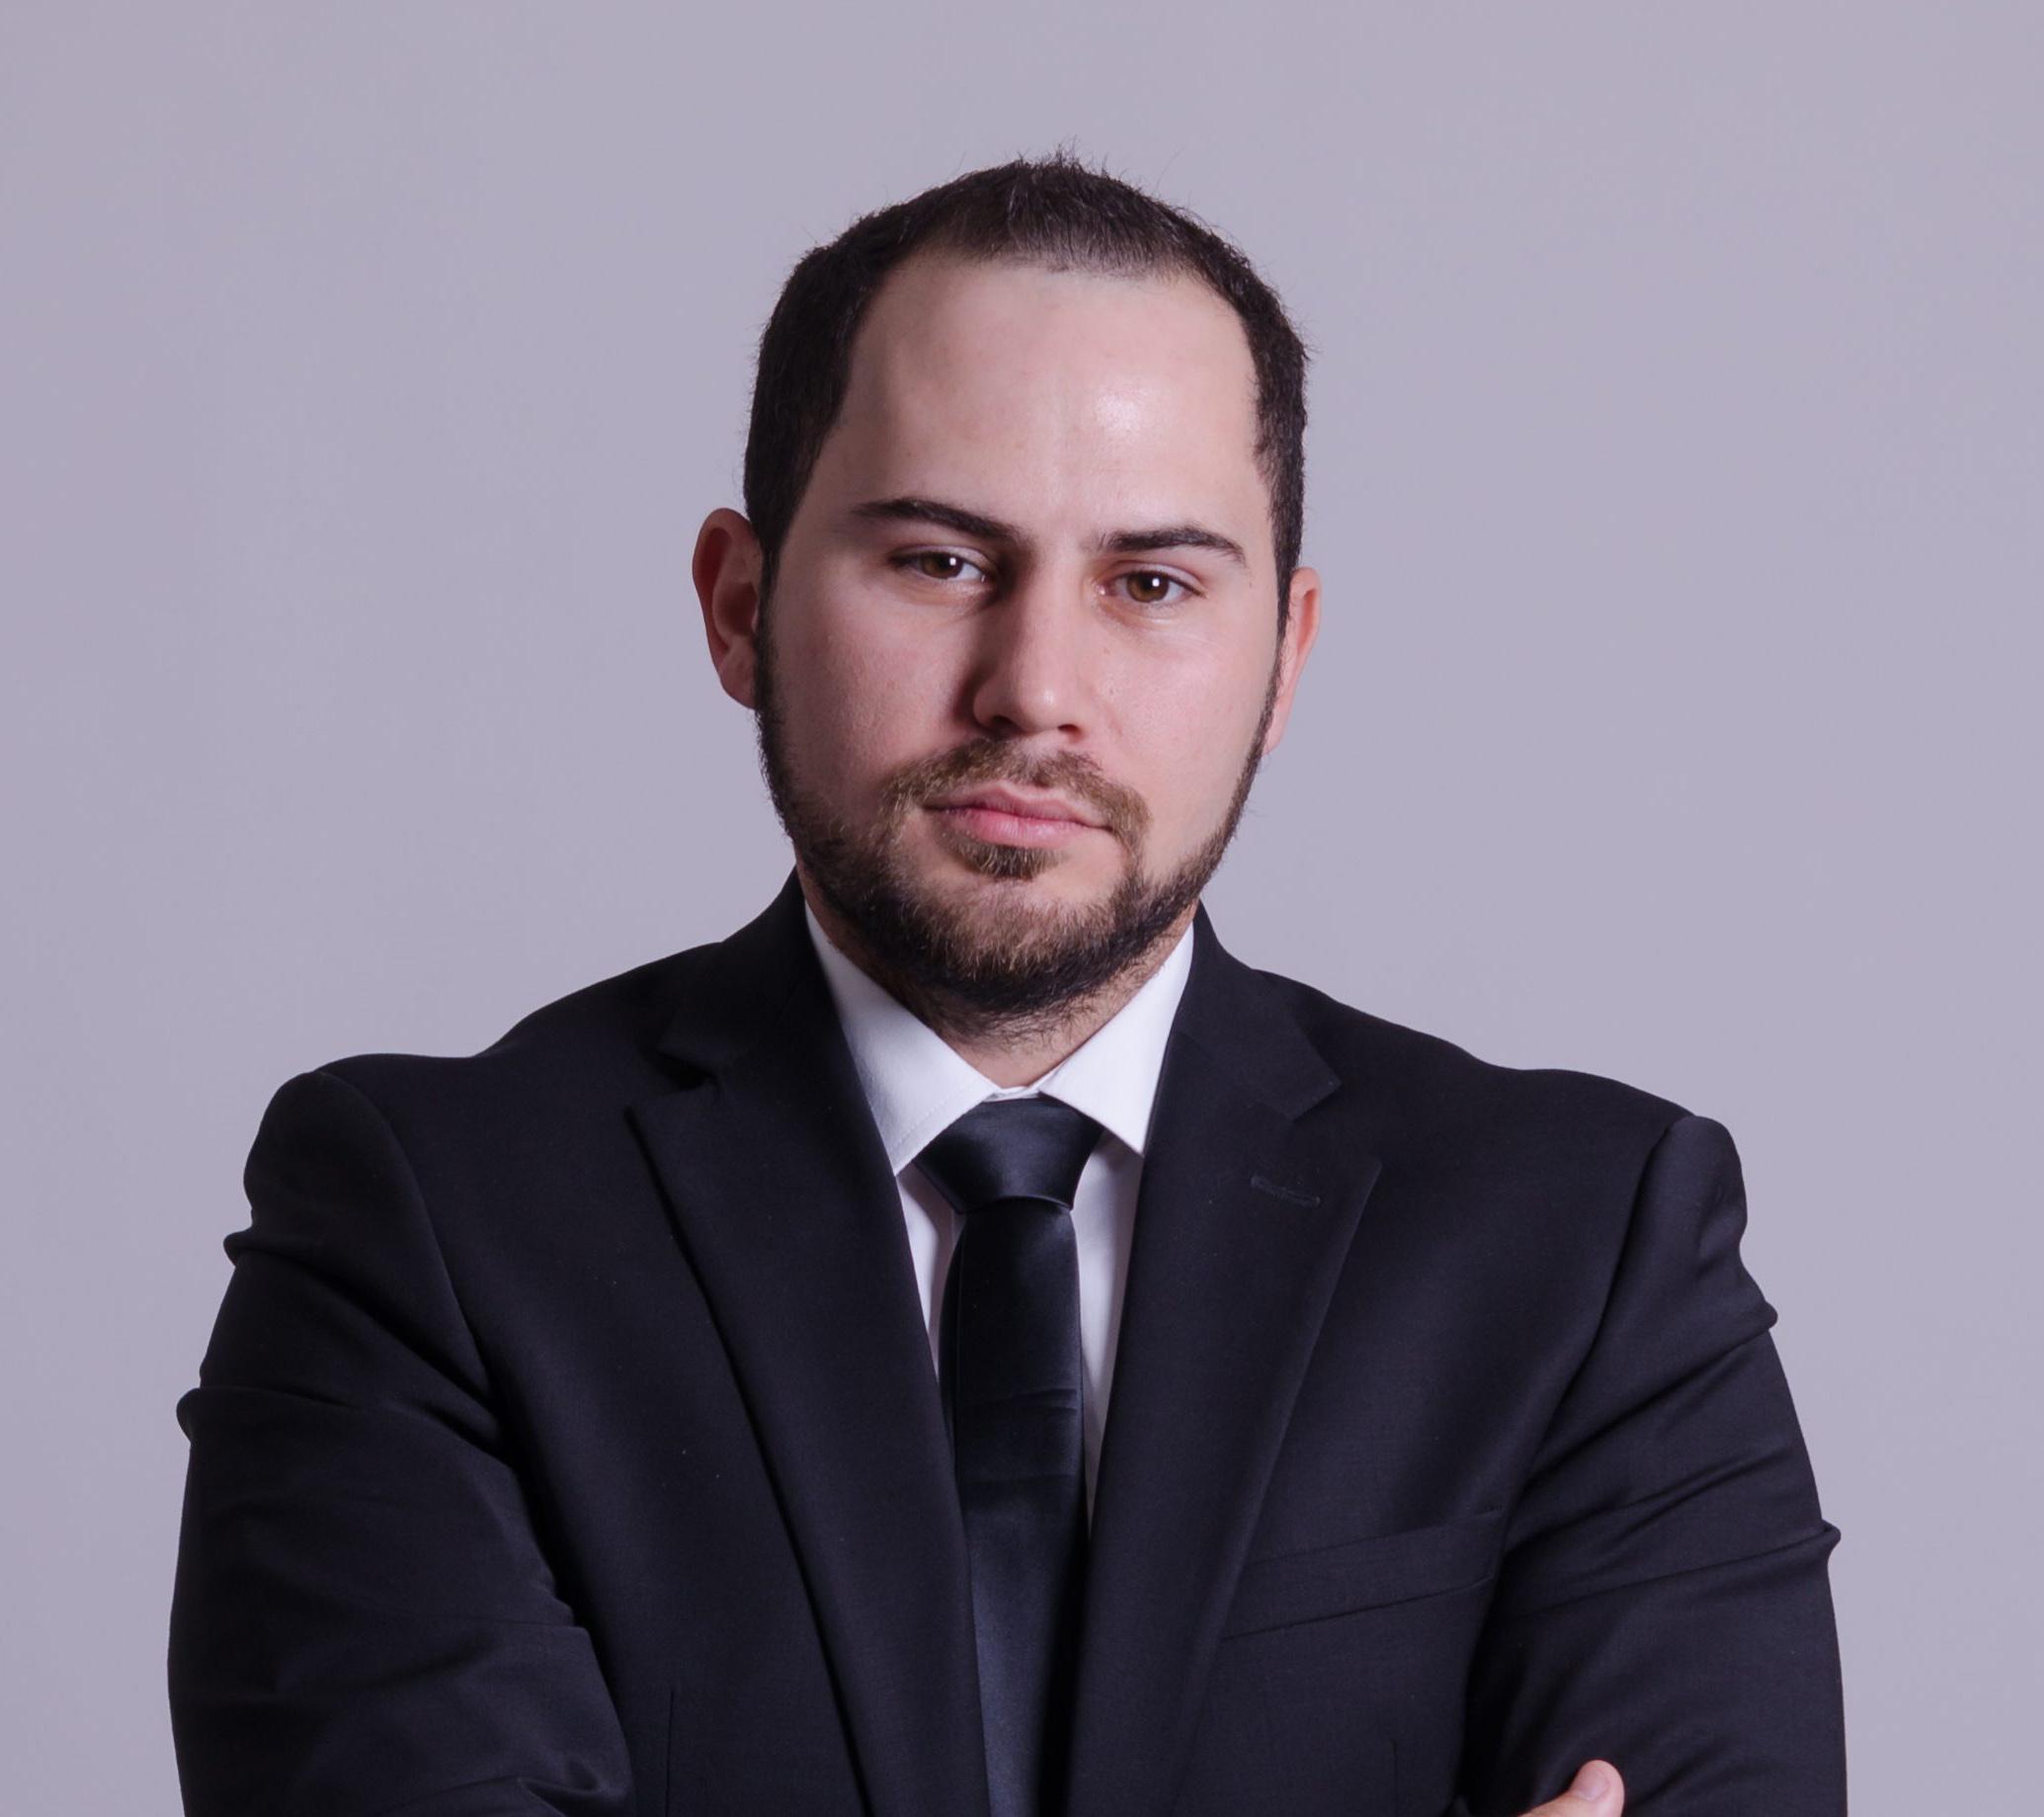 Best of Doral™ attorneys presents Raul Perez.